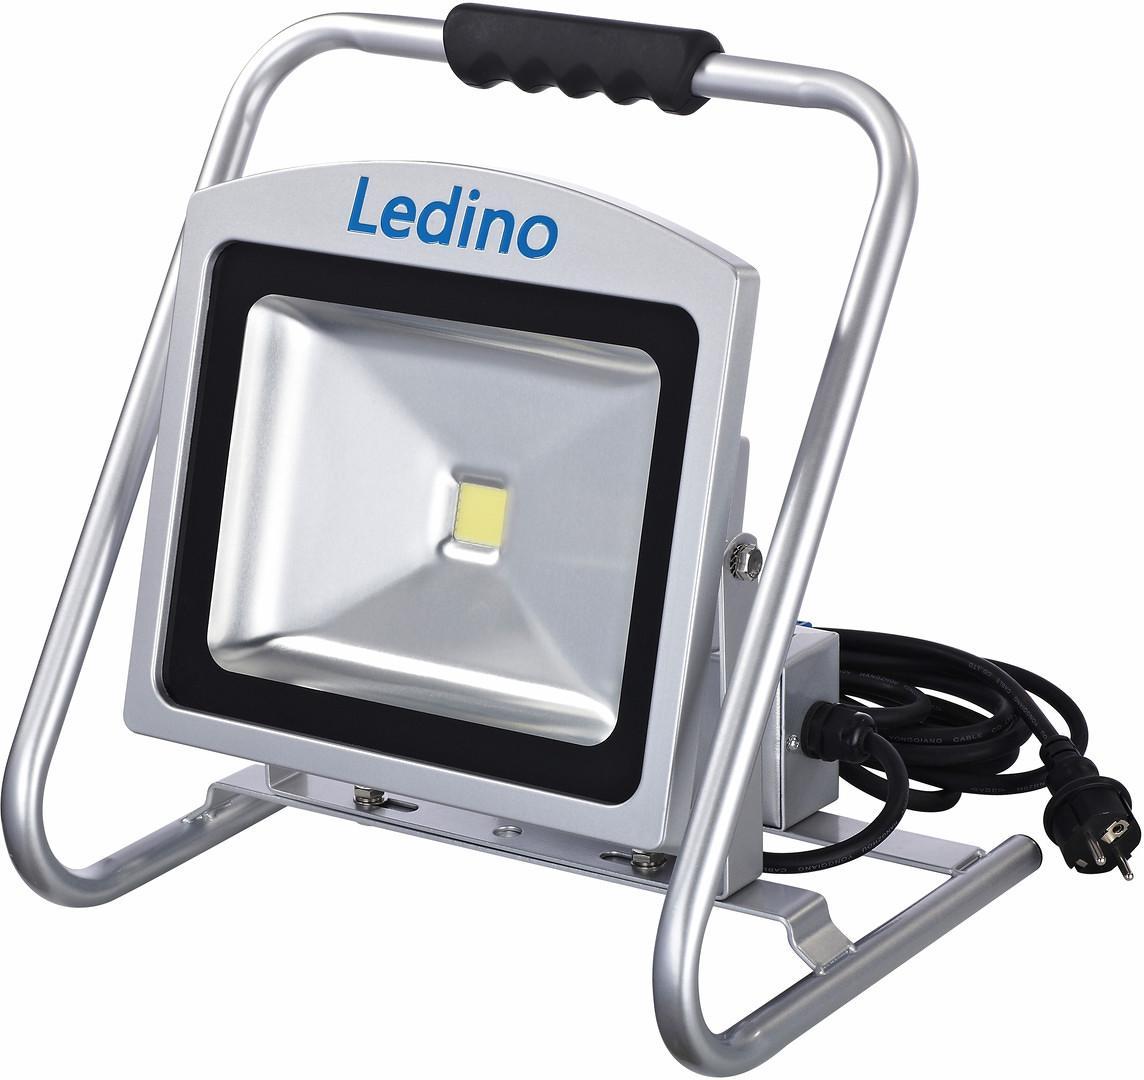 Ledino Dahlem 50scd 50w Led Strahler Mit Steckdose 11160506002011